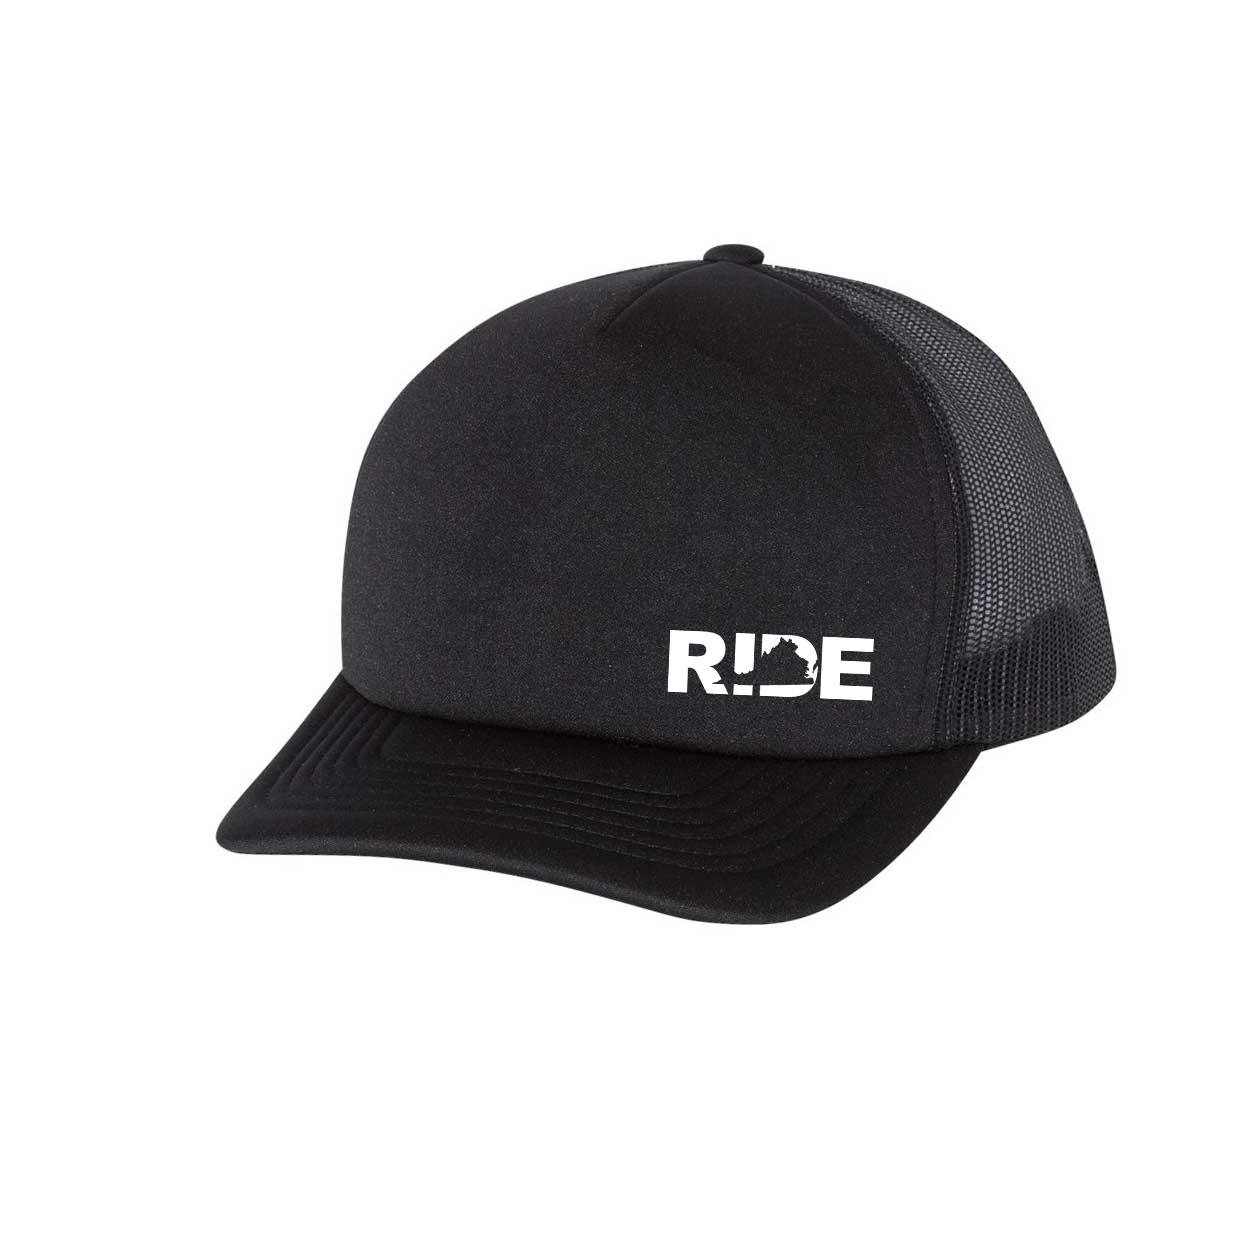 Ride Virginia Night Out Premium Foam Trucker Snapback Hat Black (White Logo)